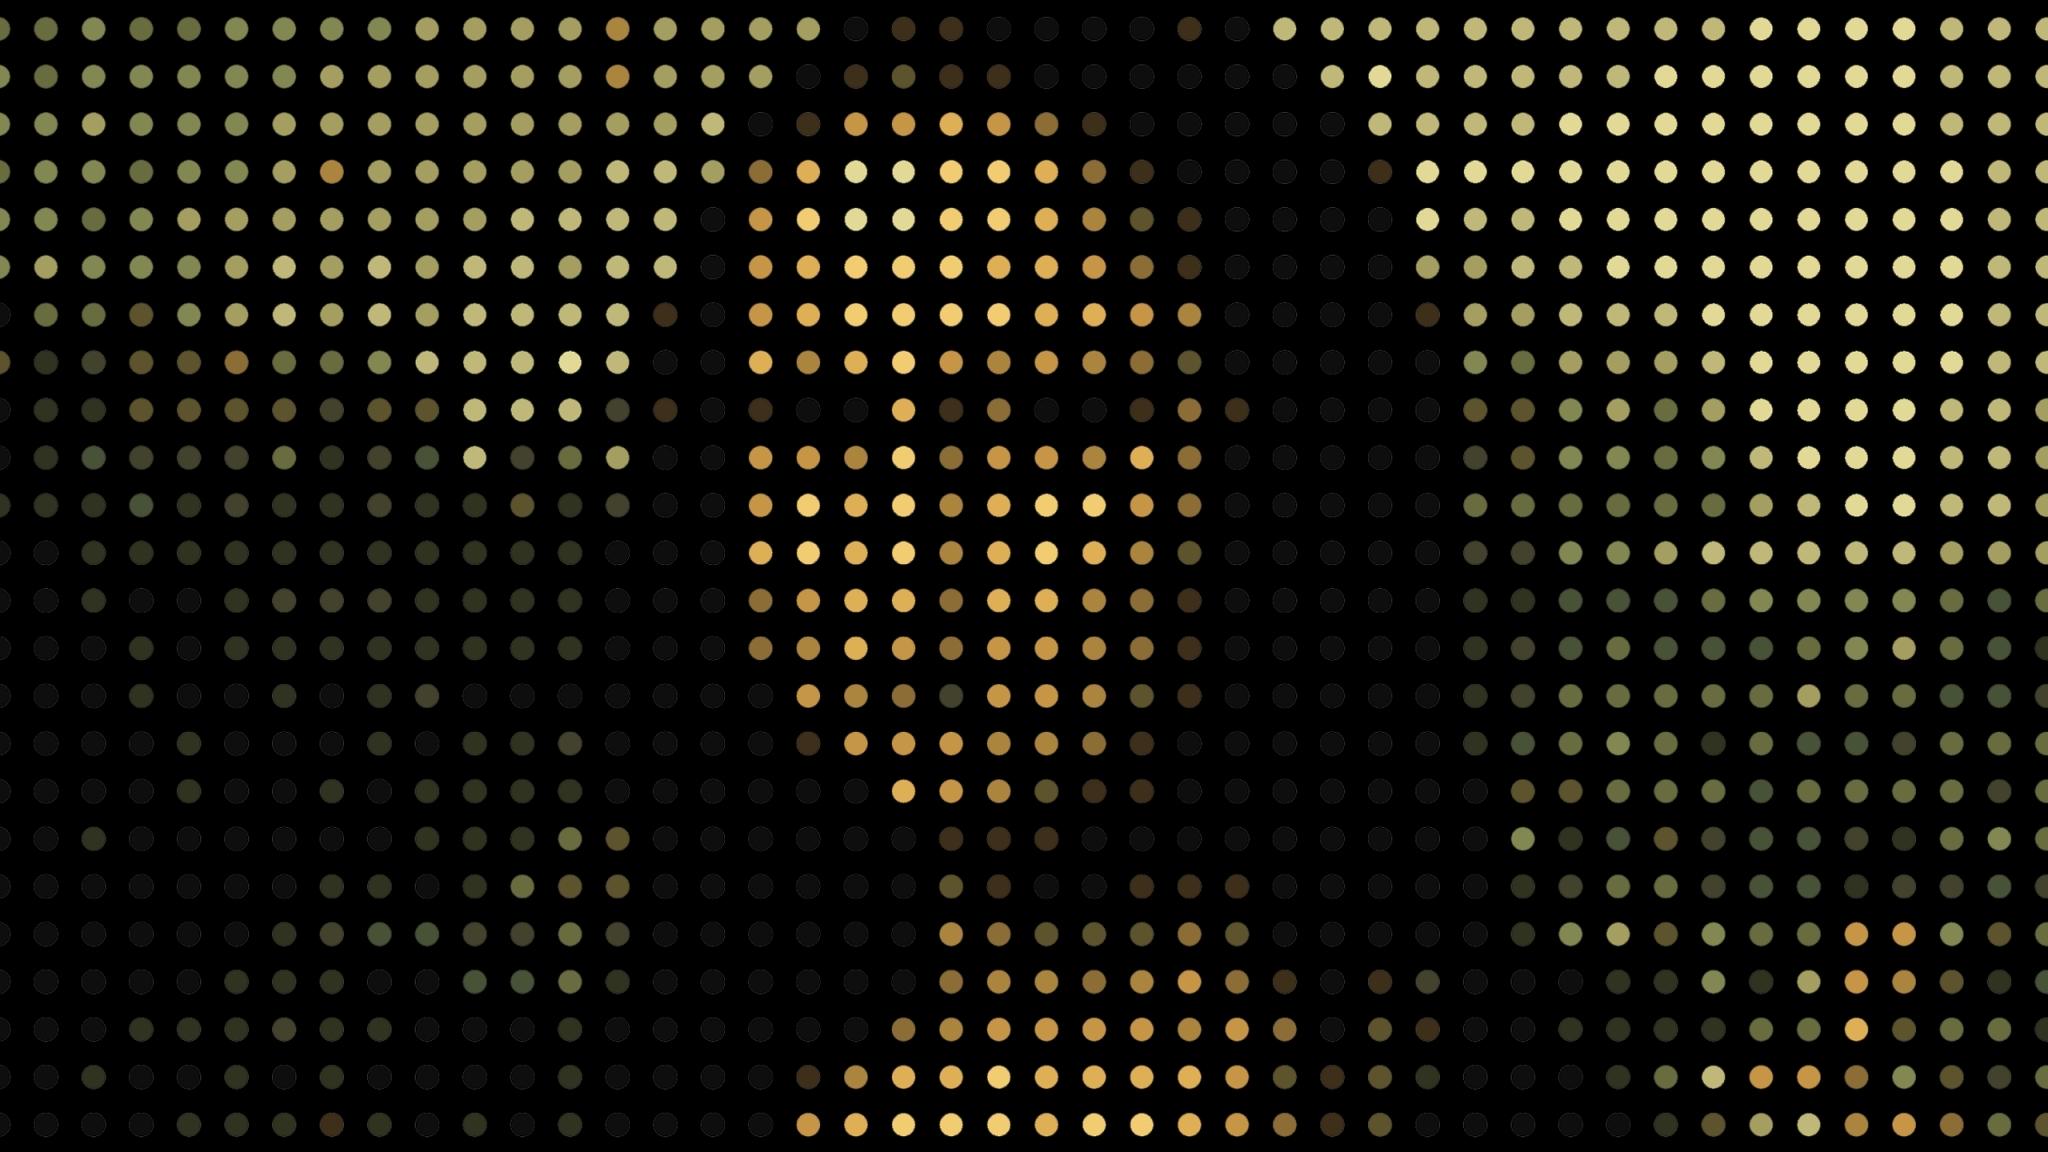 2048x1152 Mona Lisa Portrait Pixels 2048x1152 Resolution